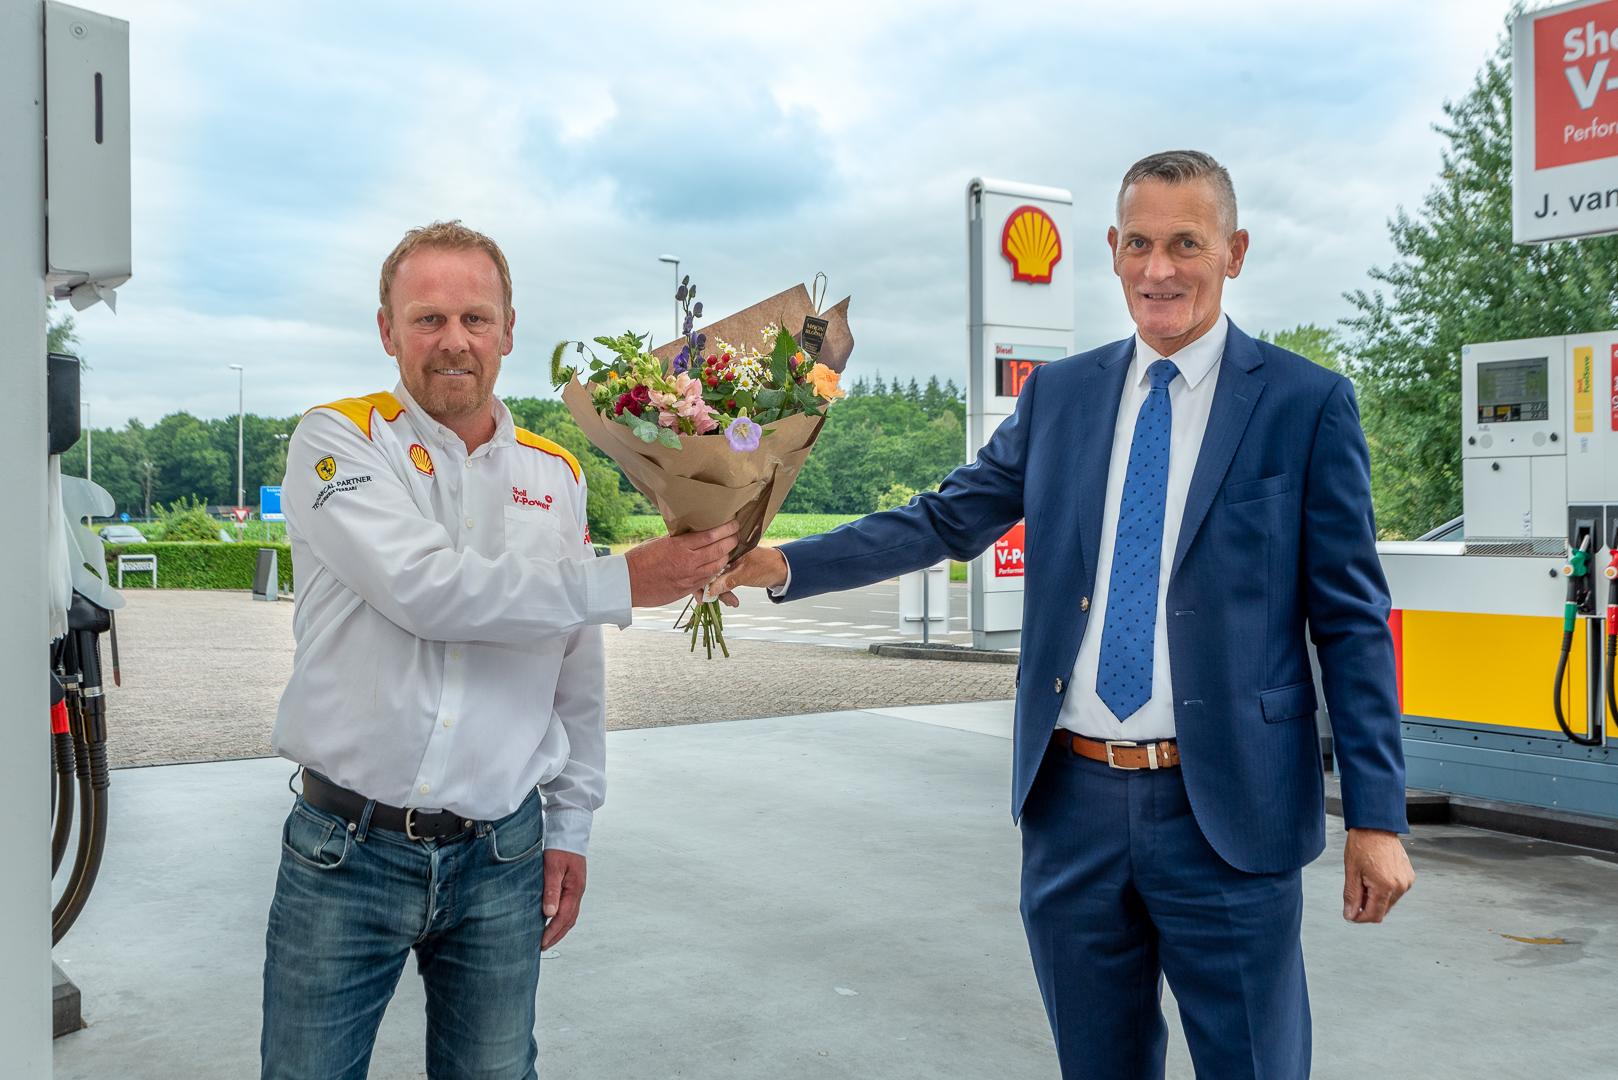 Tankstation Shell van der Vegte verlengt 3-jarig contract - Elburger SC